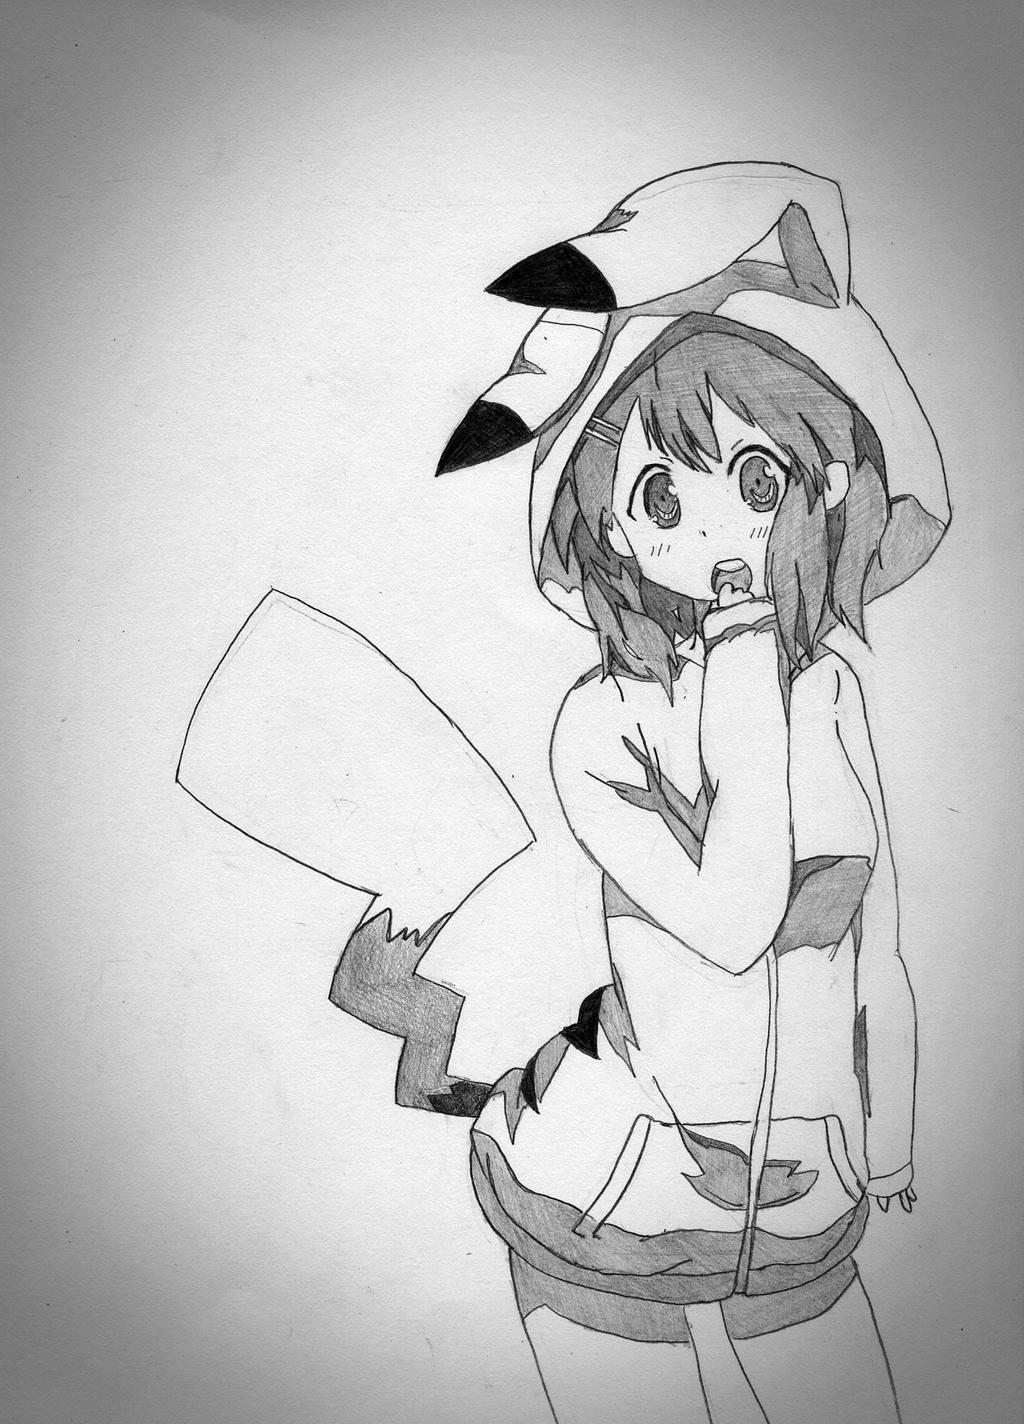 Line Art Hirasawa Yui : Yui hirasawa by betasix on deviantart